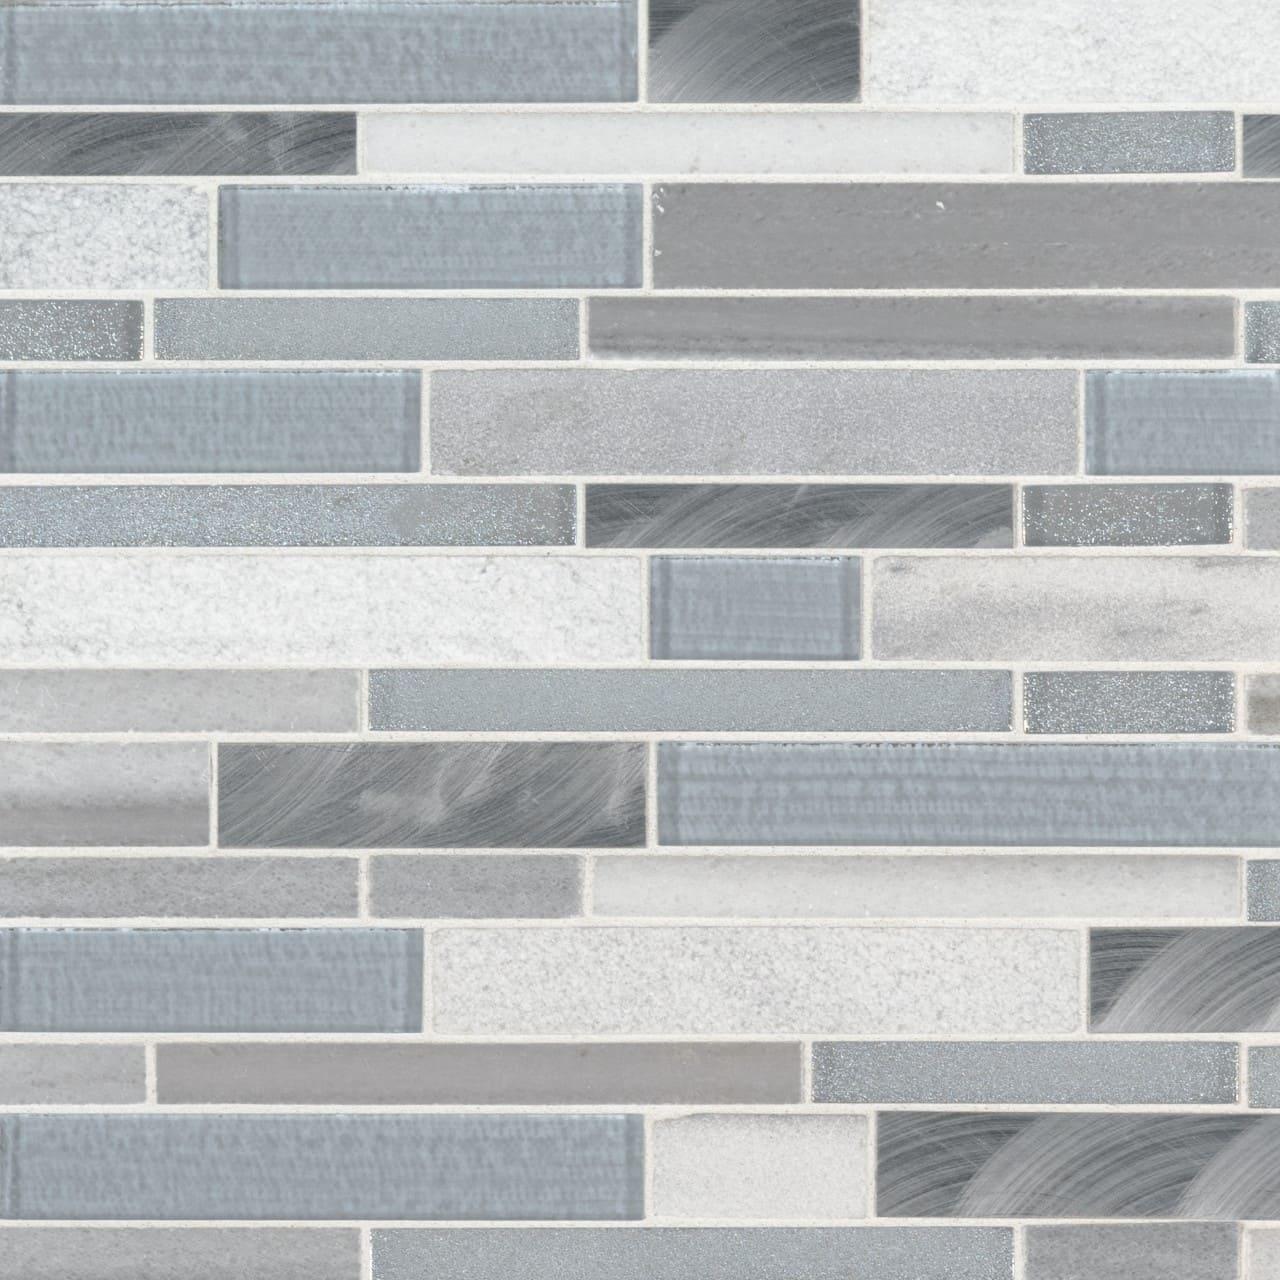 Harlow Interlocking Glass Tile